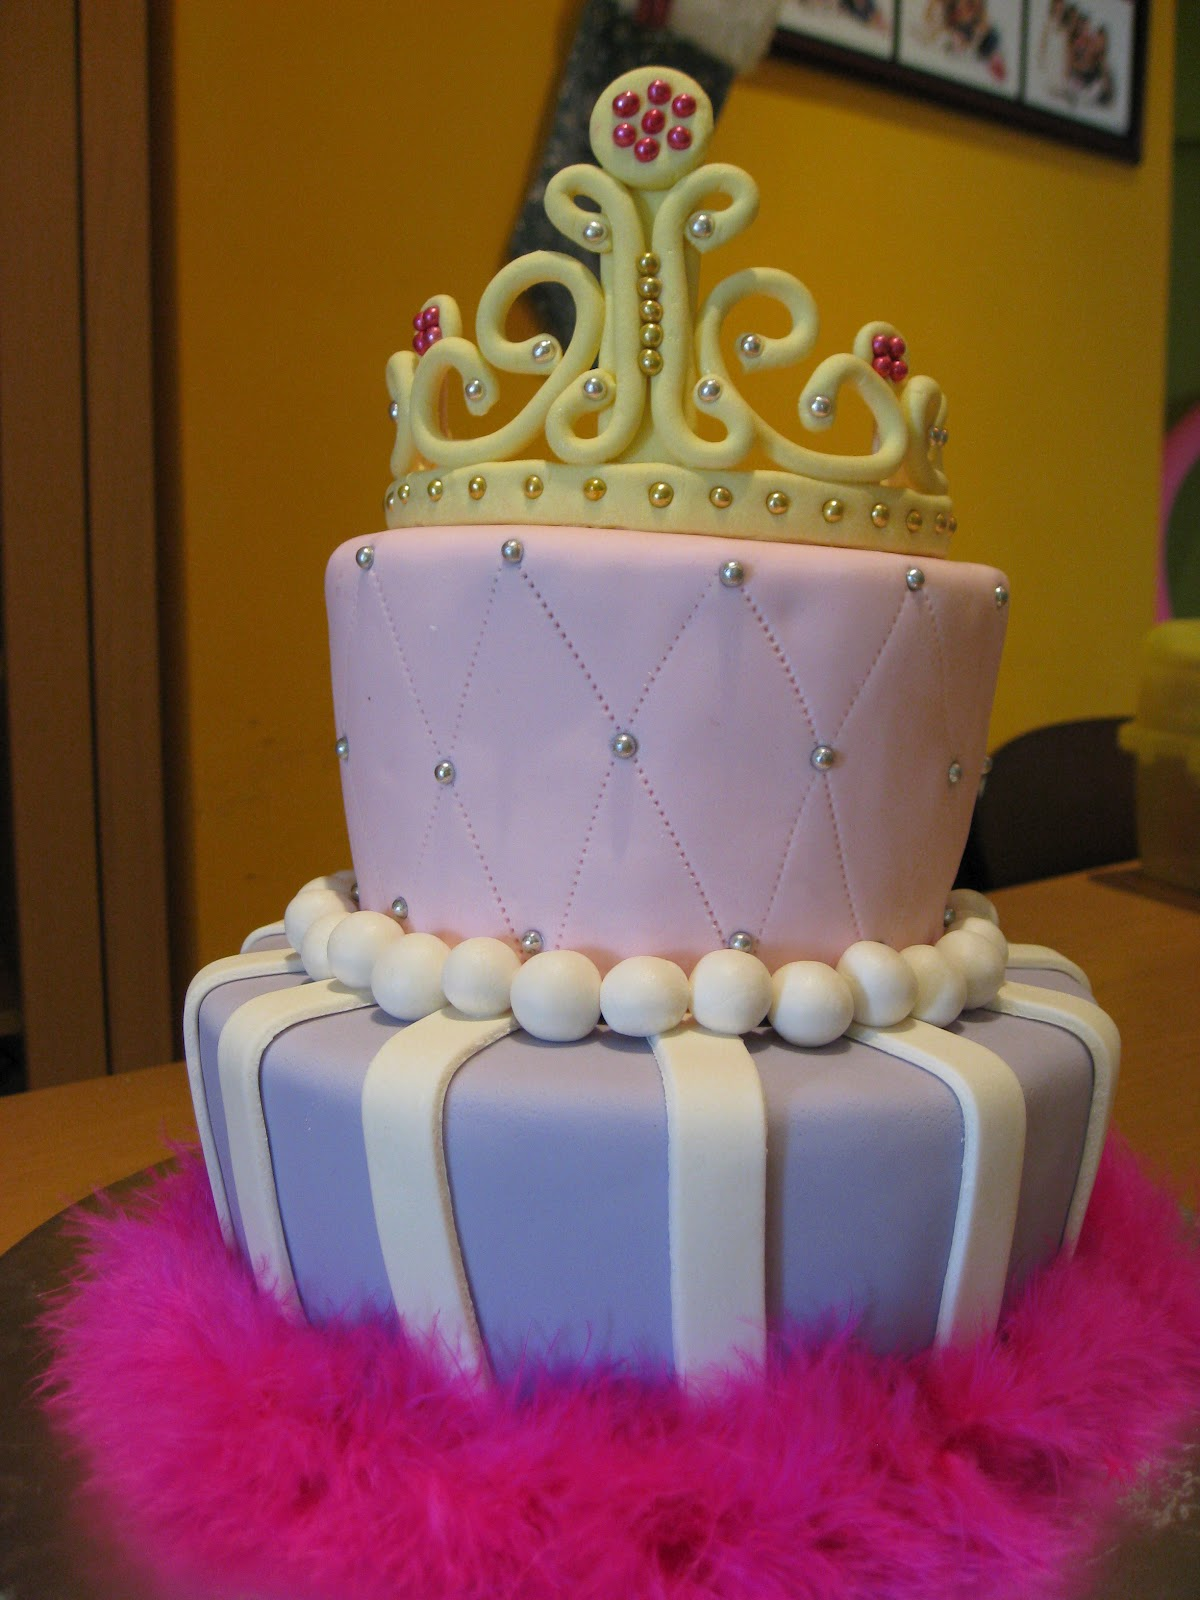 The Nocturnal Baker Princess Tiara Fondant Birthday Cake